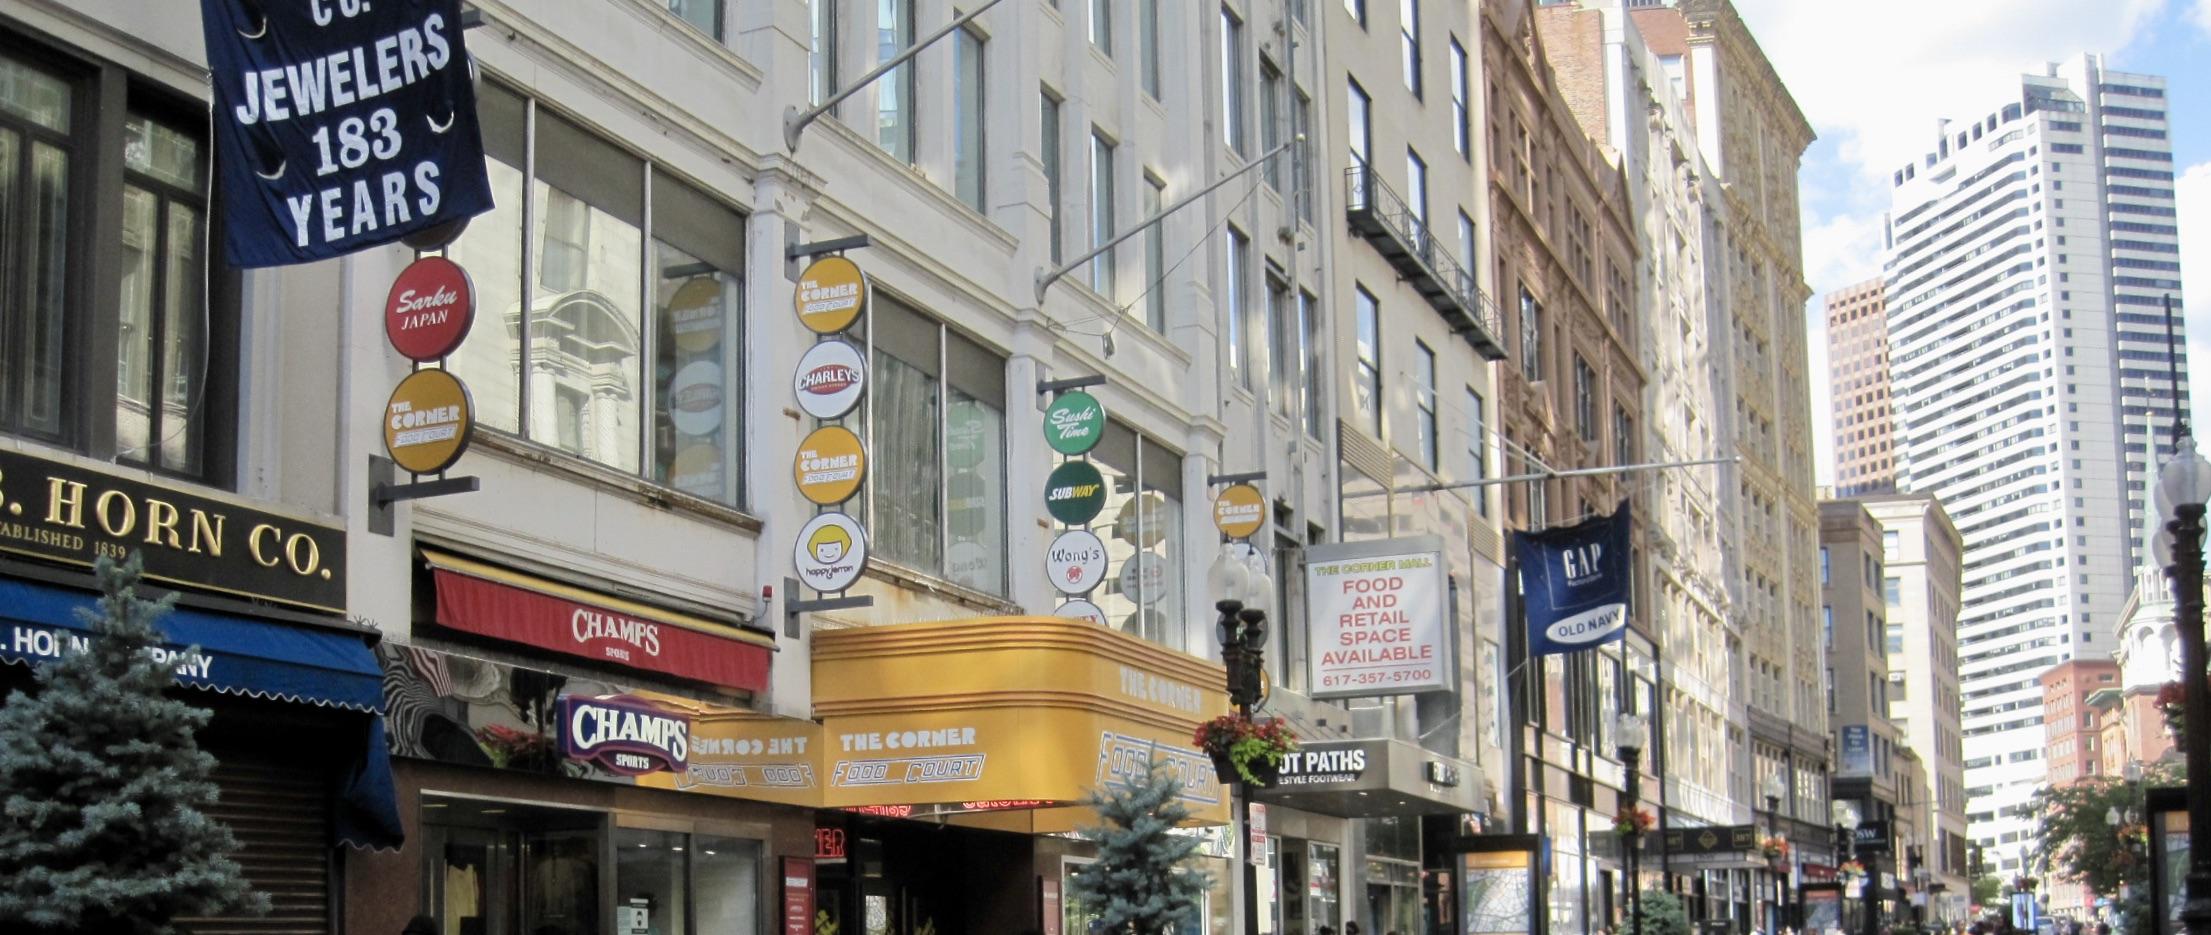 Washington Street Shops in Downtown Crossing